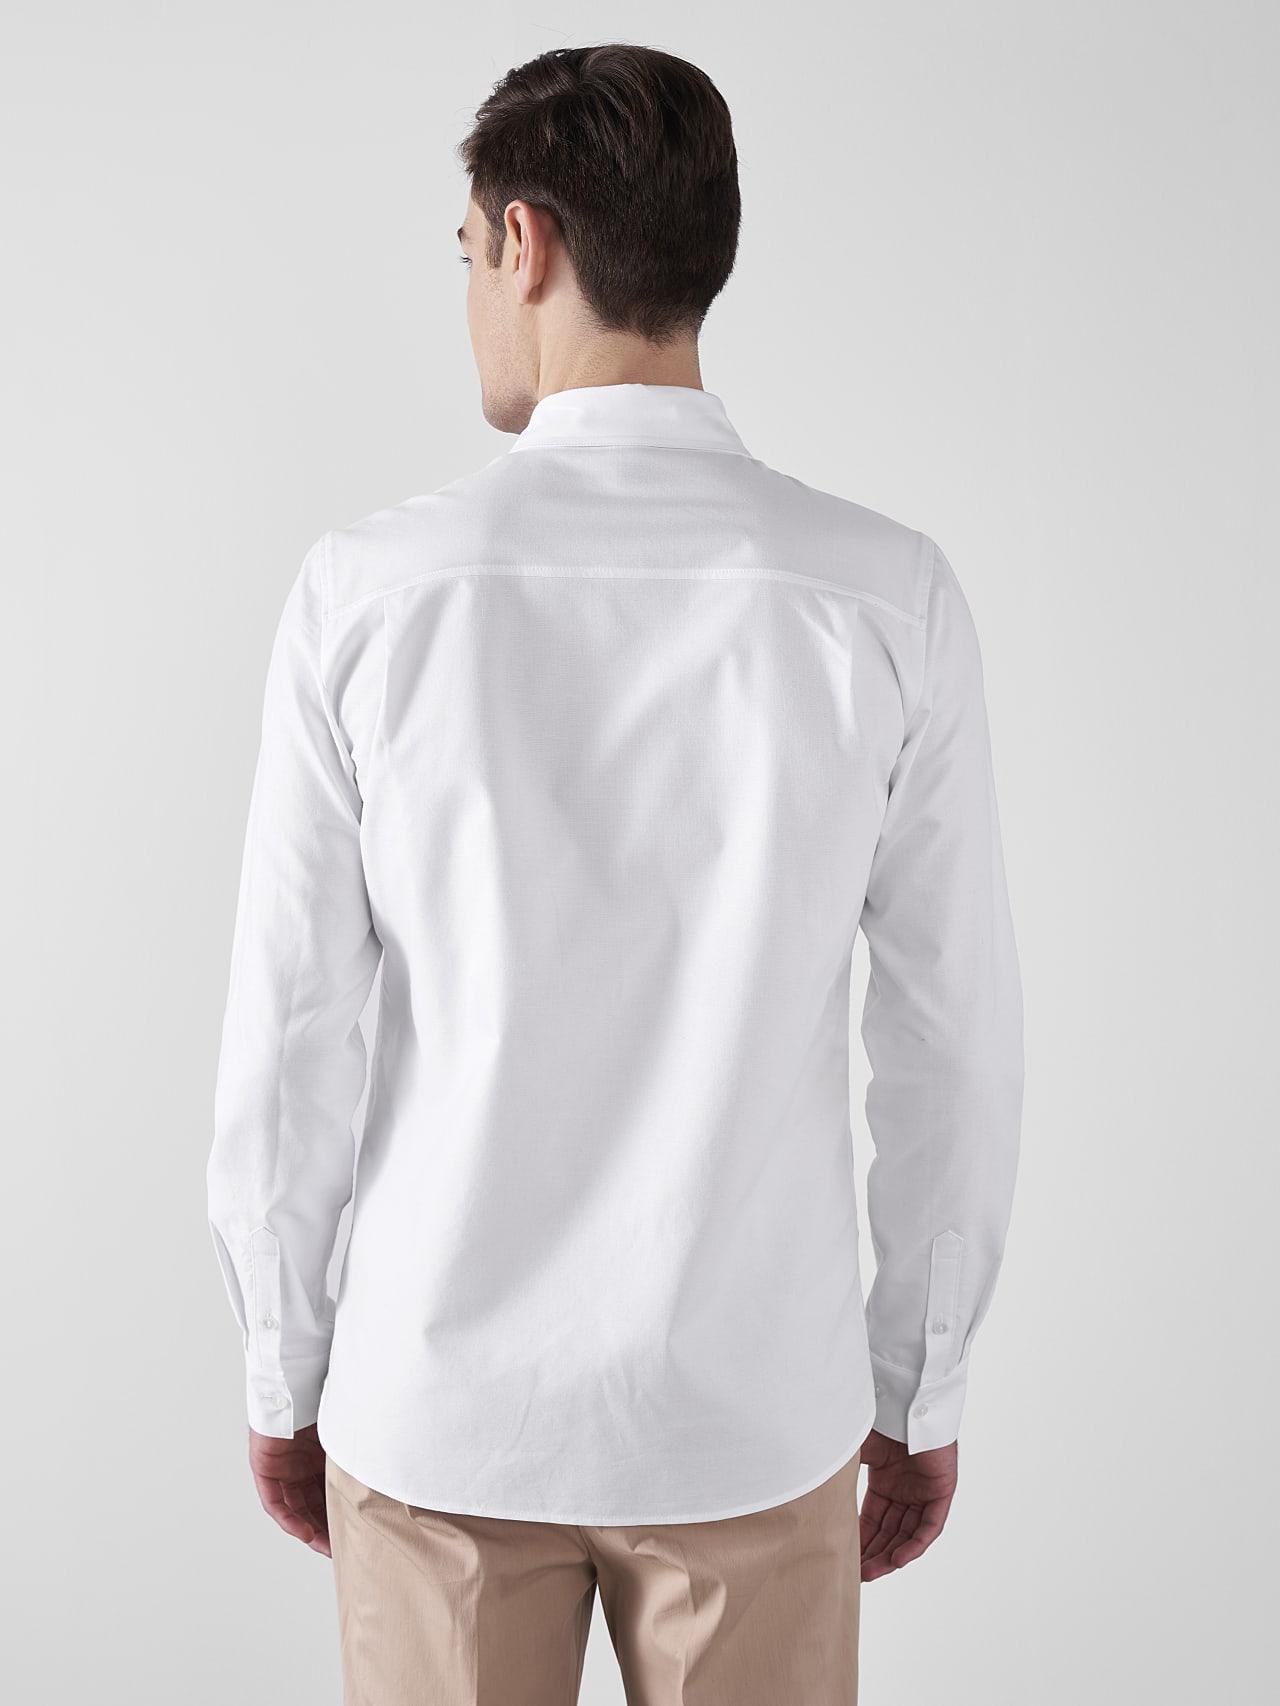 WOSKA V2.Y5.01 Kent Collar Oxford Shirt white Front Main Alpha Tauri